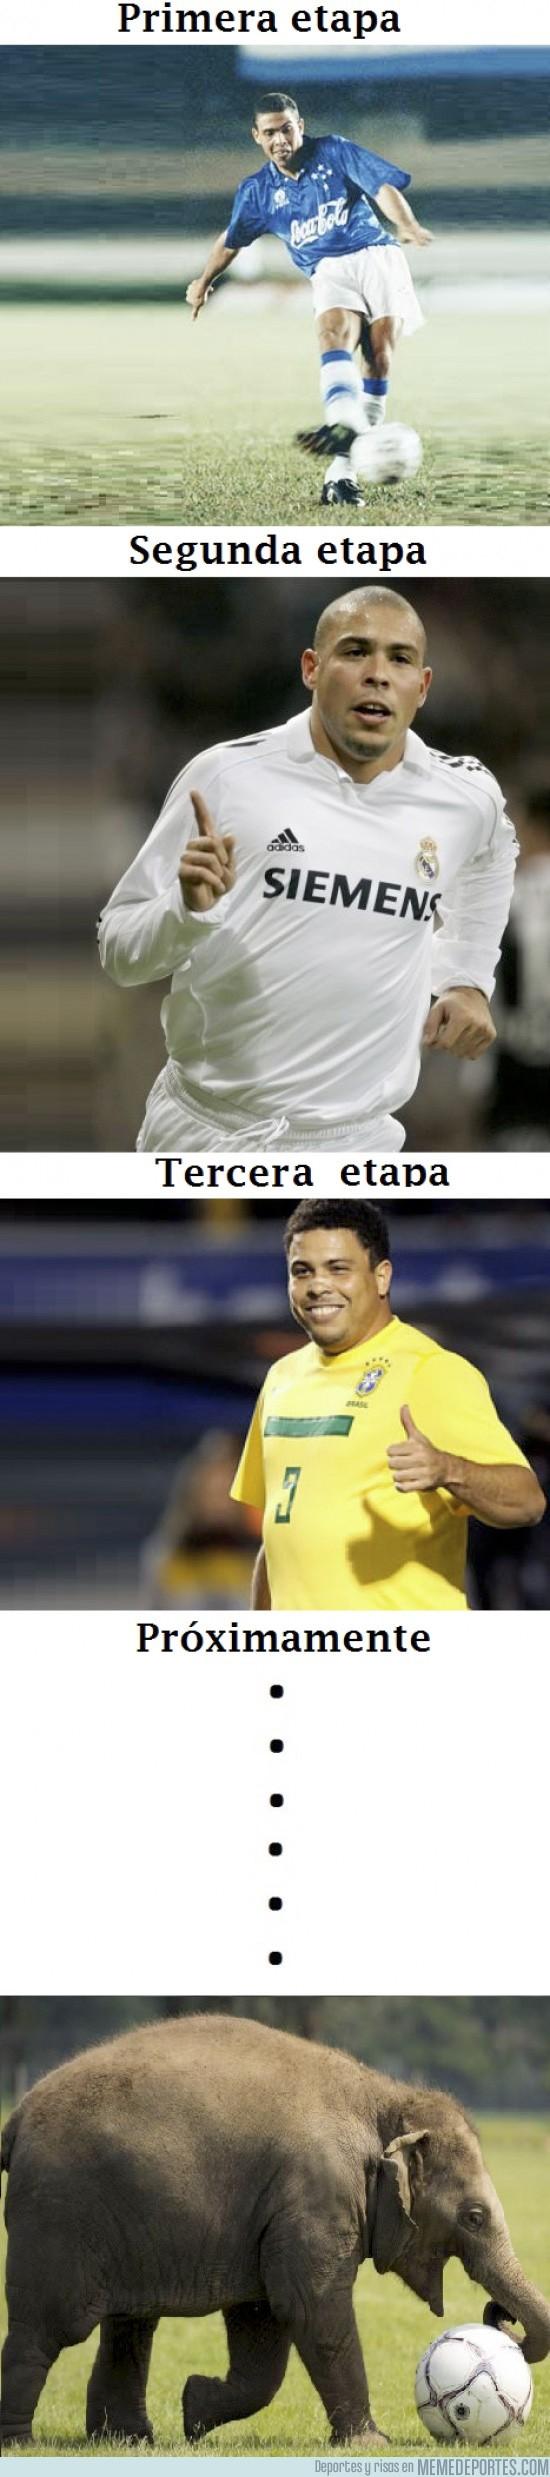 13266 - Las etapas físicas de Ronaldo